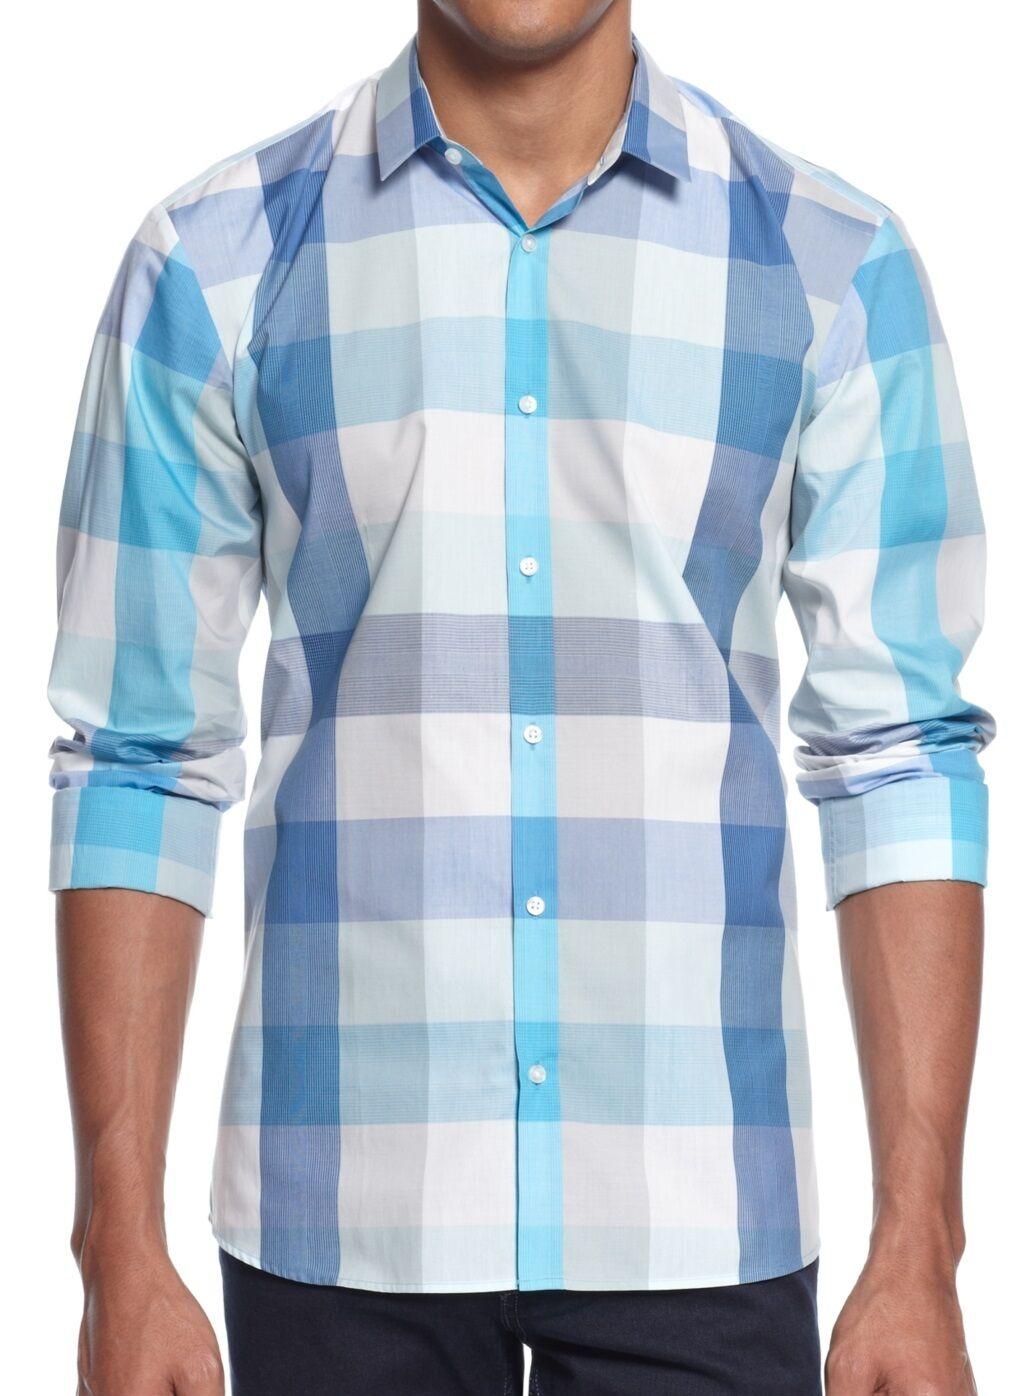 NEW HUGO (Red Label) by Hugo Boss Slim Fit Lightweight Plaid Sport Shirt Size L